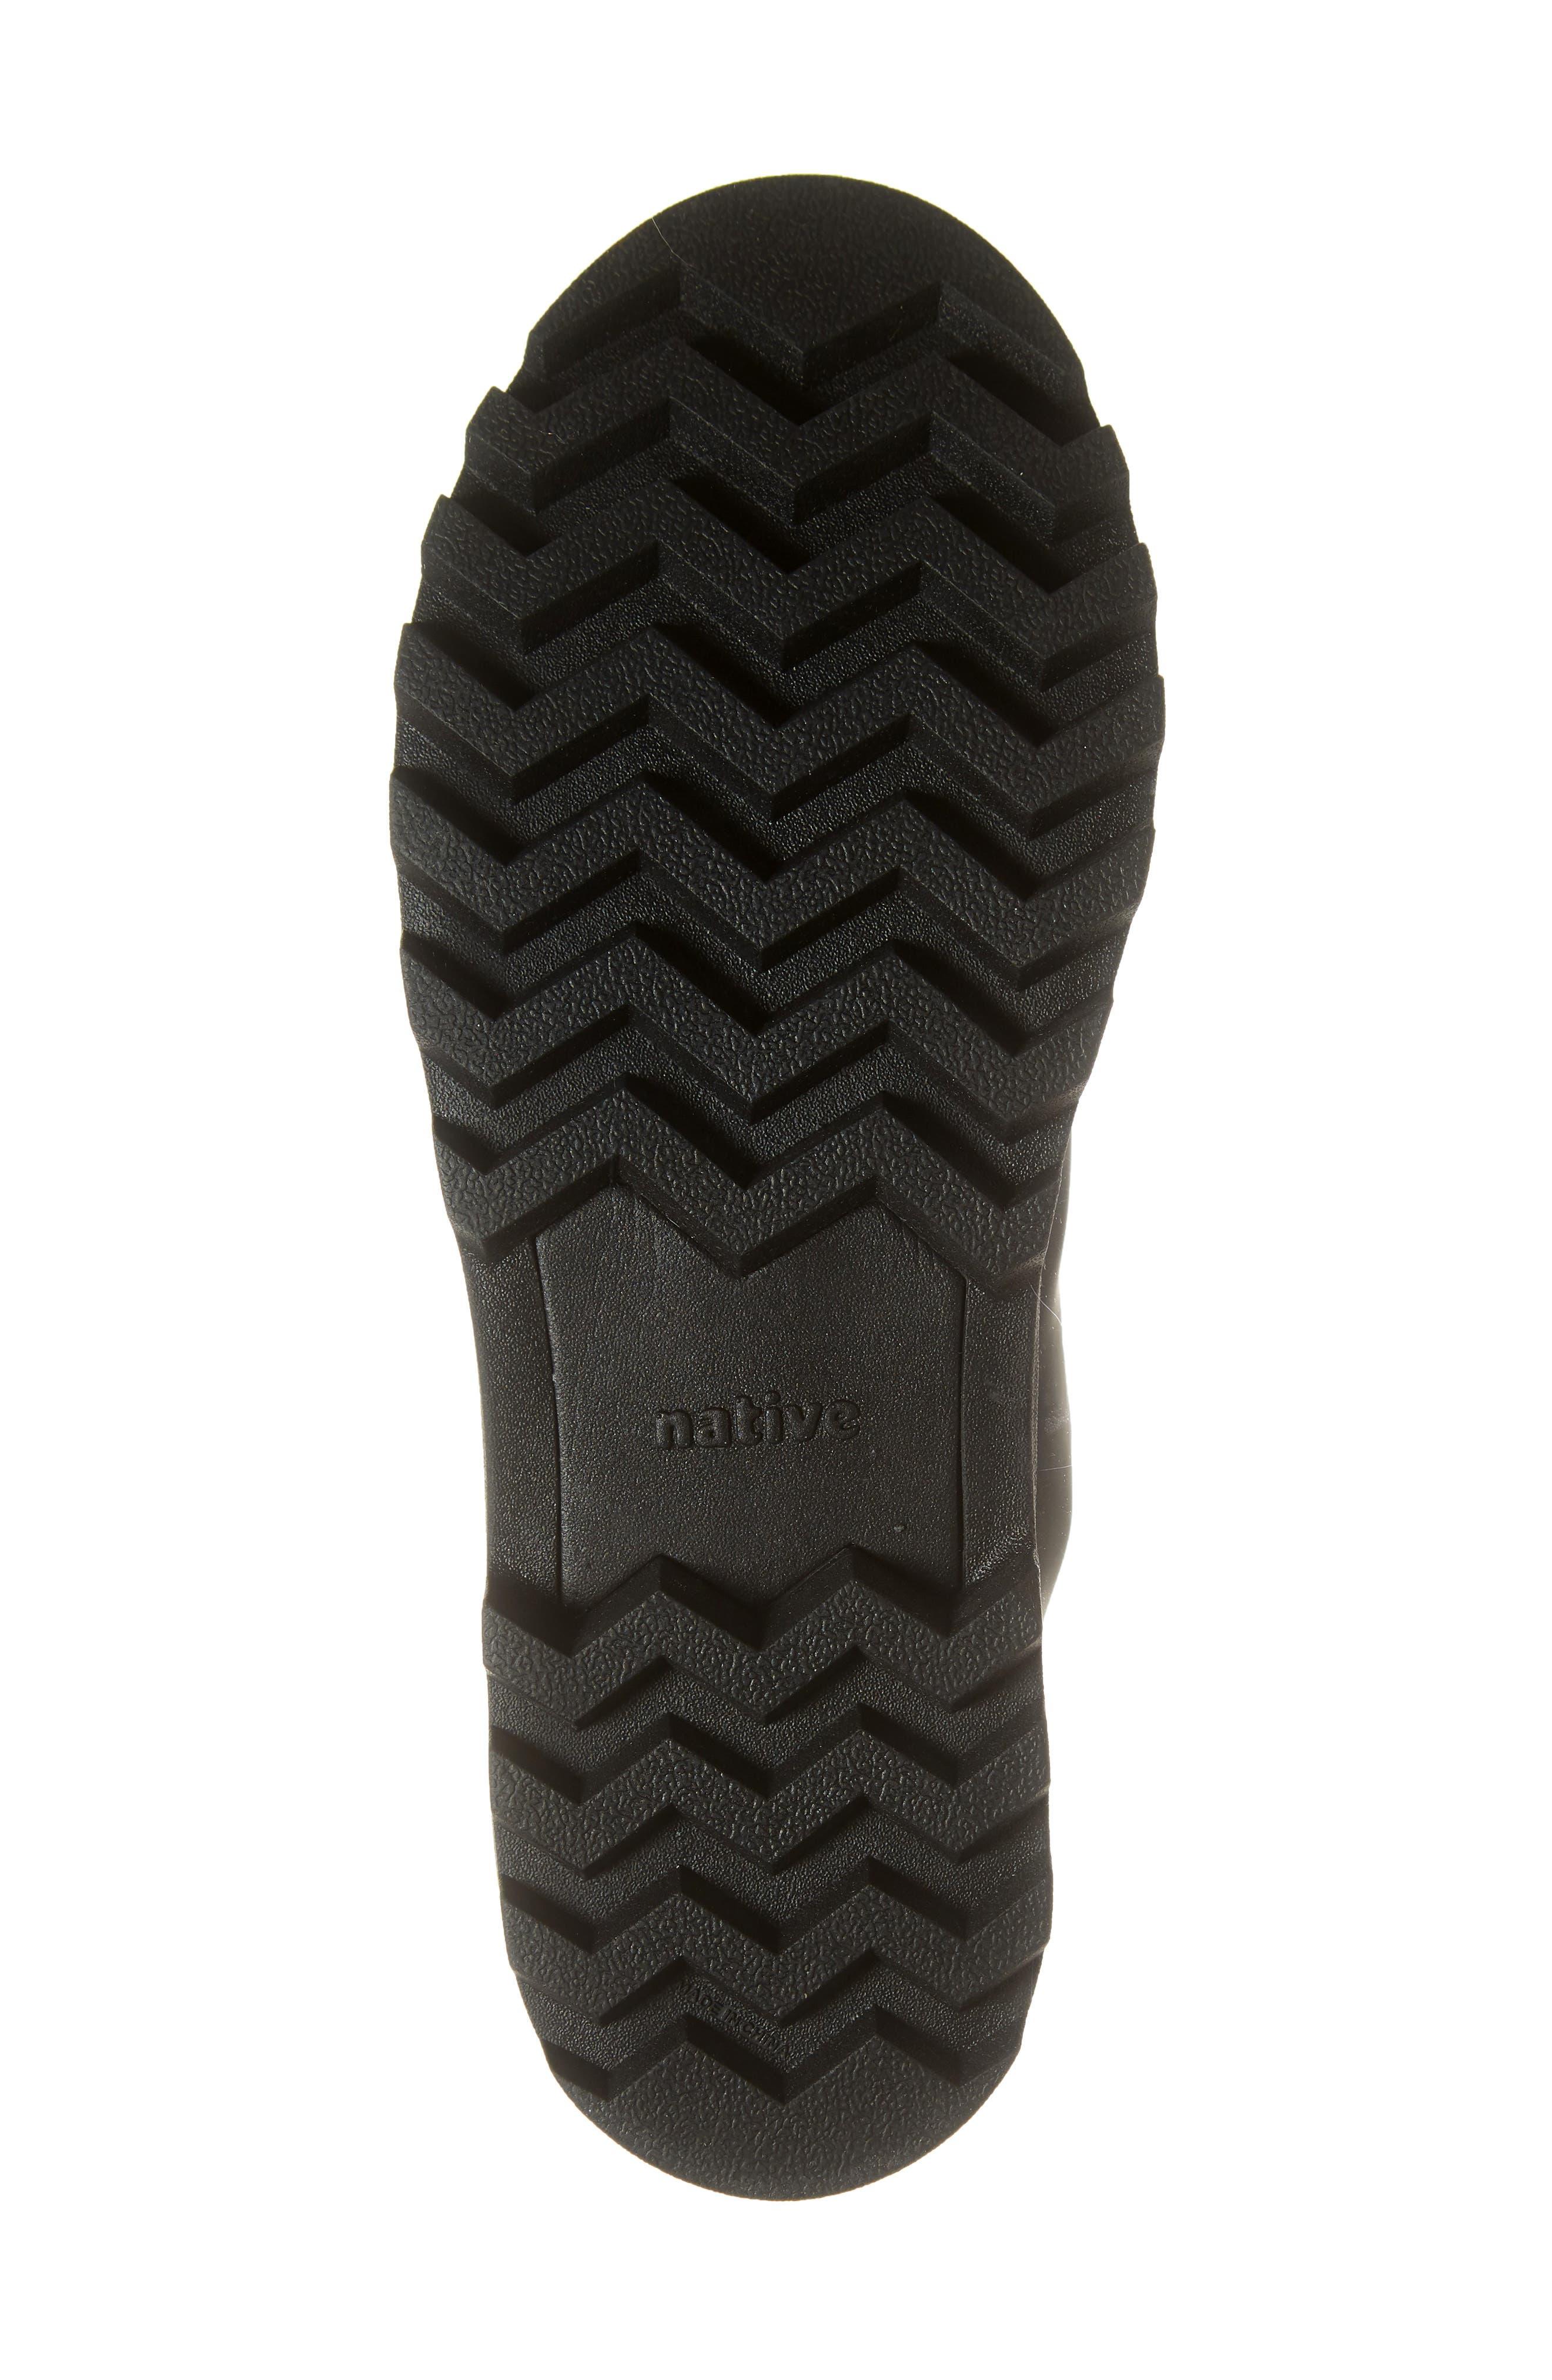 Native Johnny Treklite Water Repellent Boot,                             Alternate thumbnail 6, color,                             JIFFY BLACK/ JIFFY BLACK